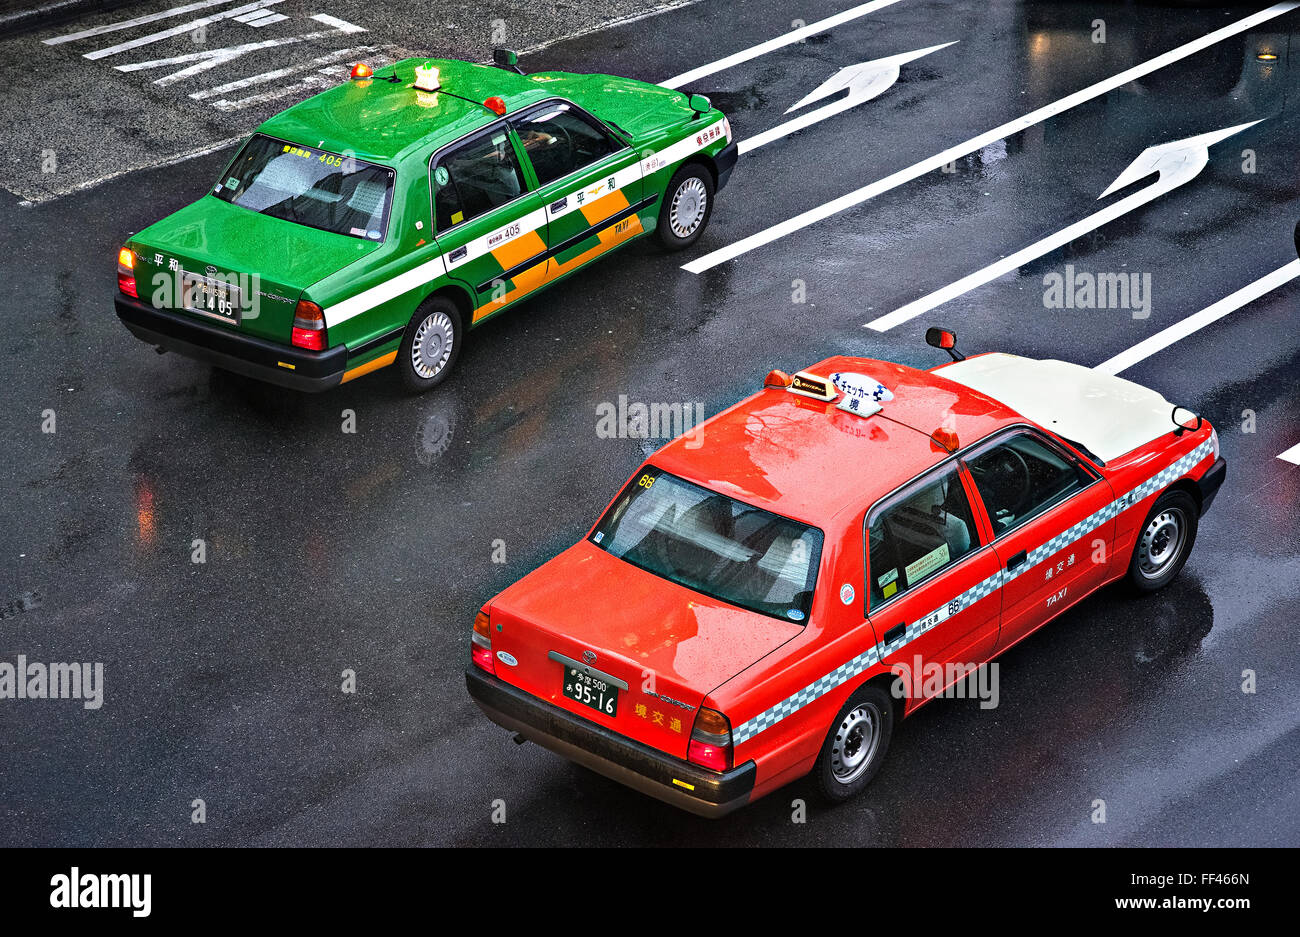 Giappone, isola di Honshu, Kanto, Tokyo, taxi. Immagini Stock